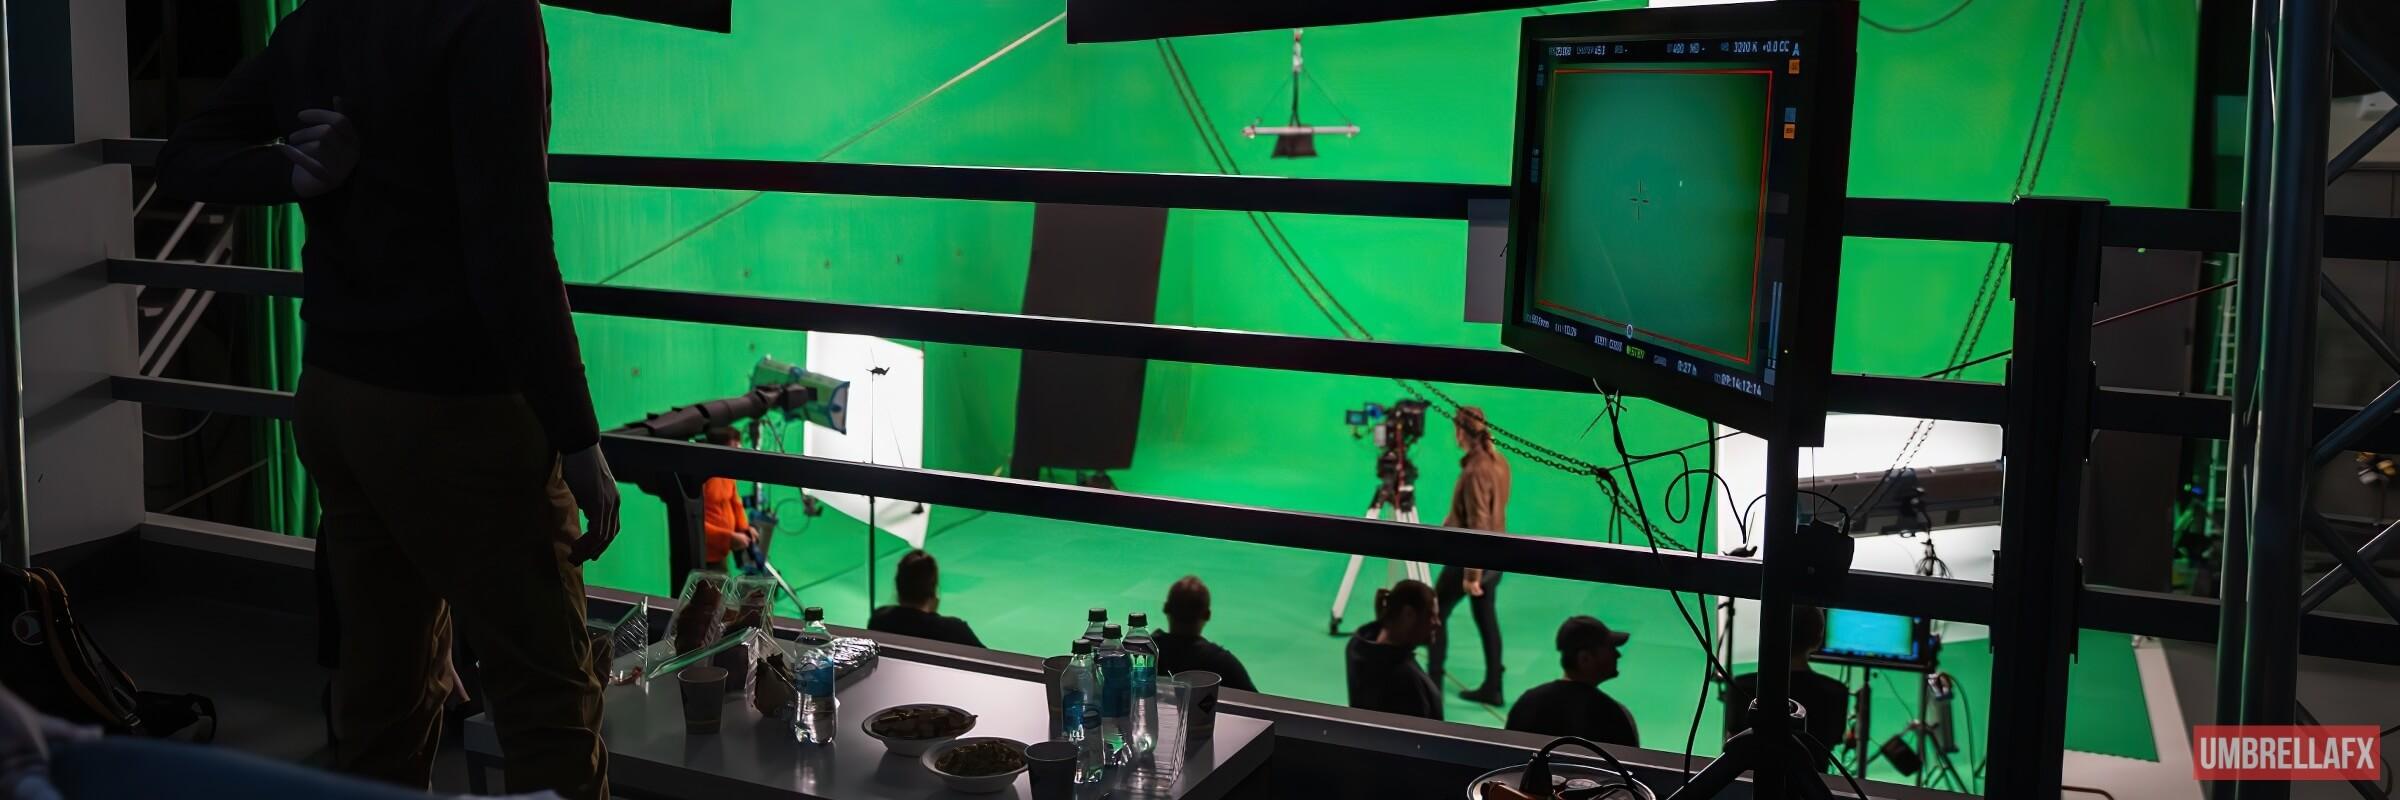 UmbrellaFX_On_the_Set_Ostermann_22